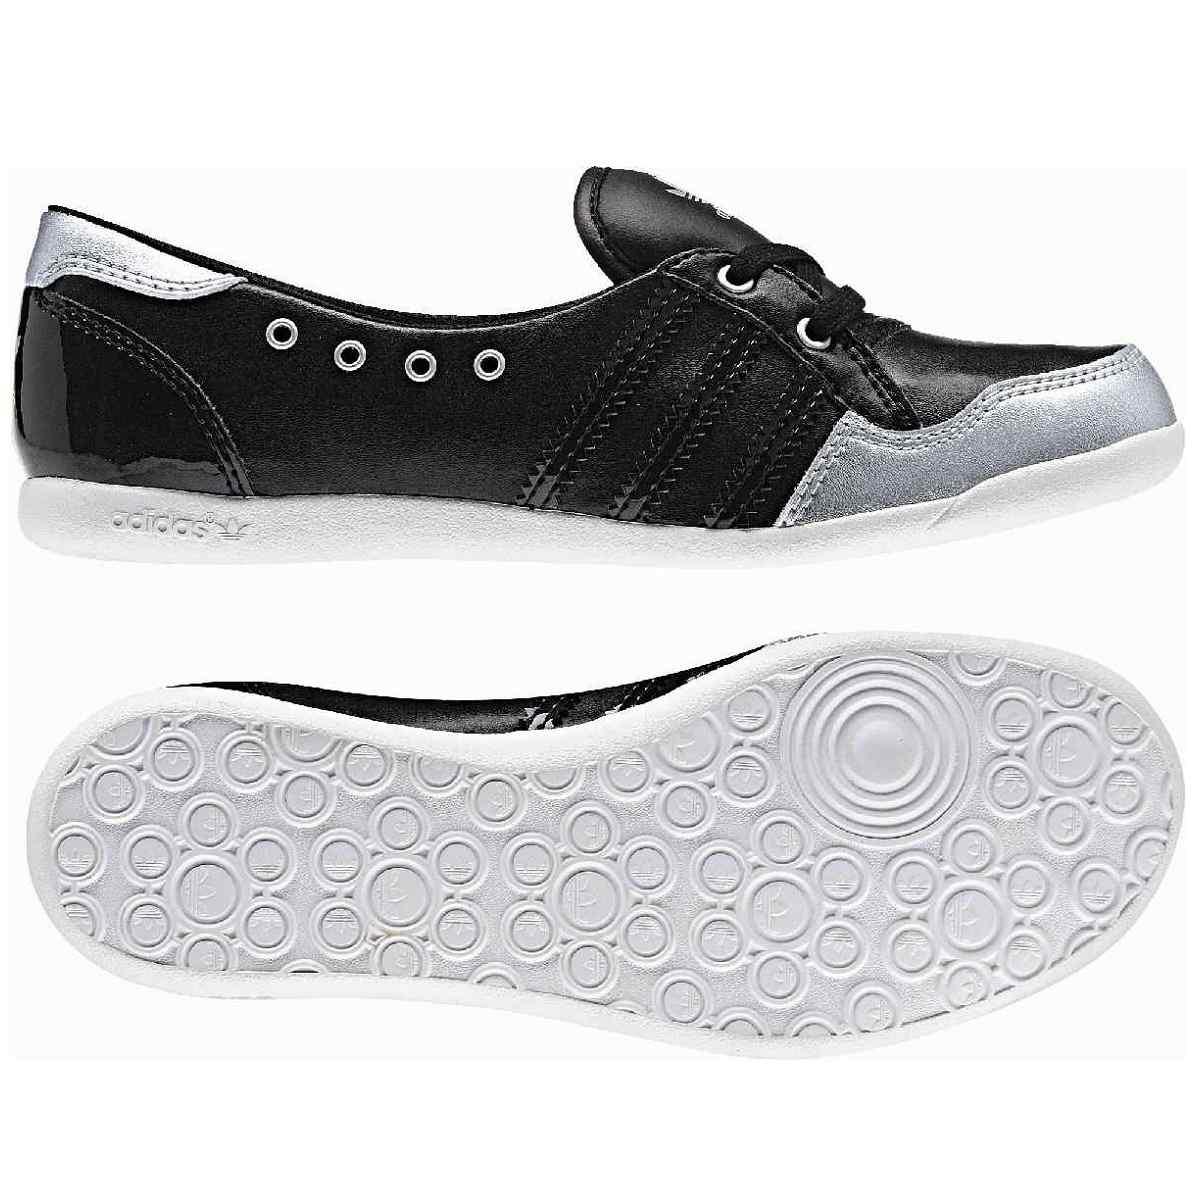 Adidas Slipper Damen